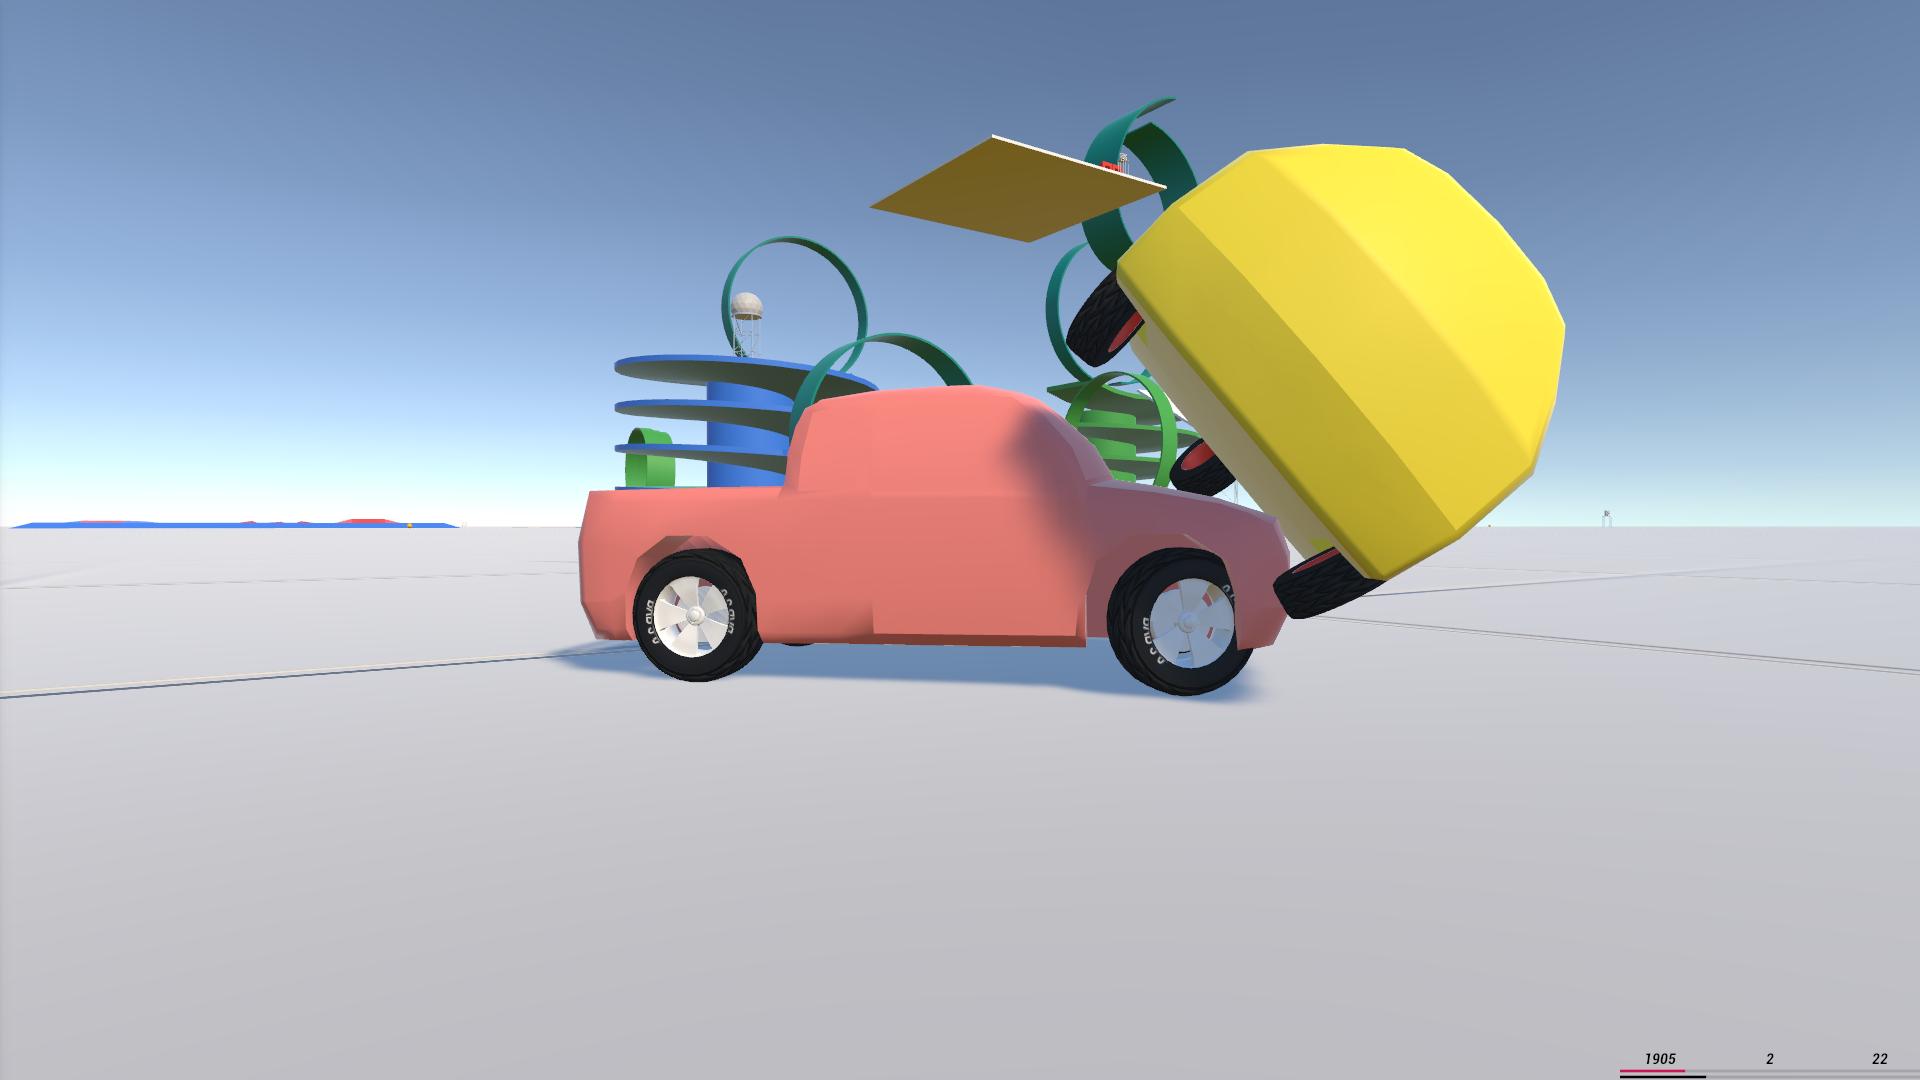 Project Wheels